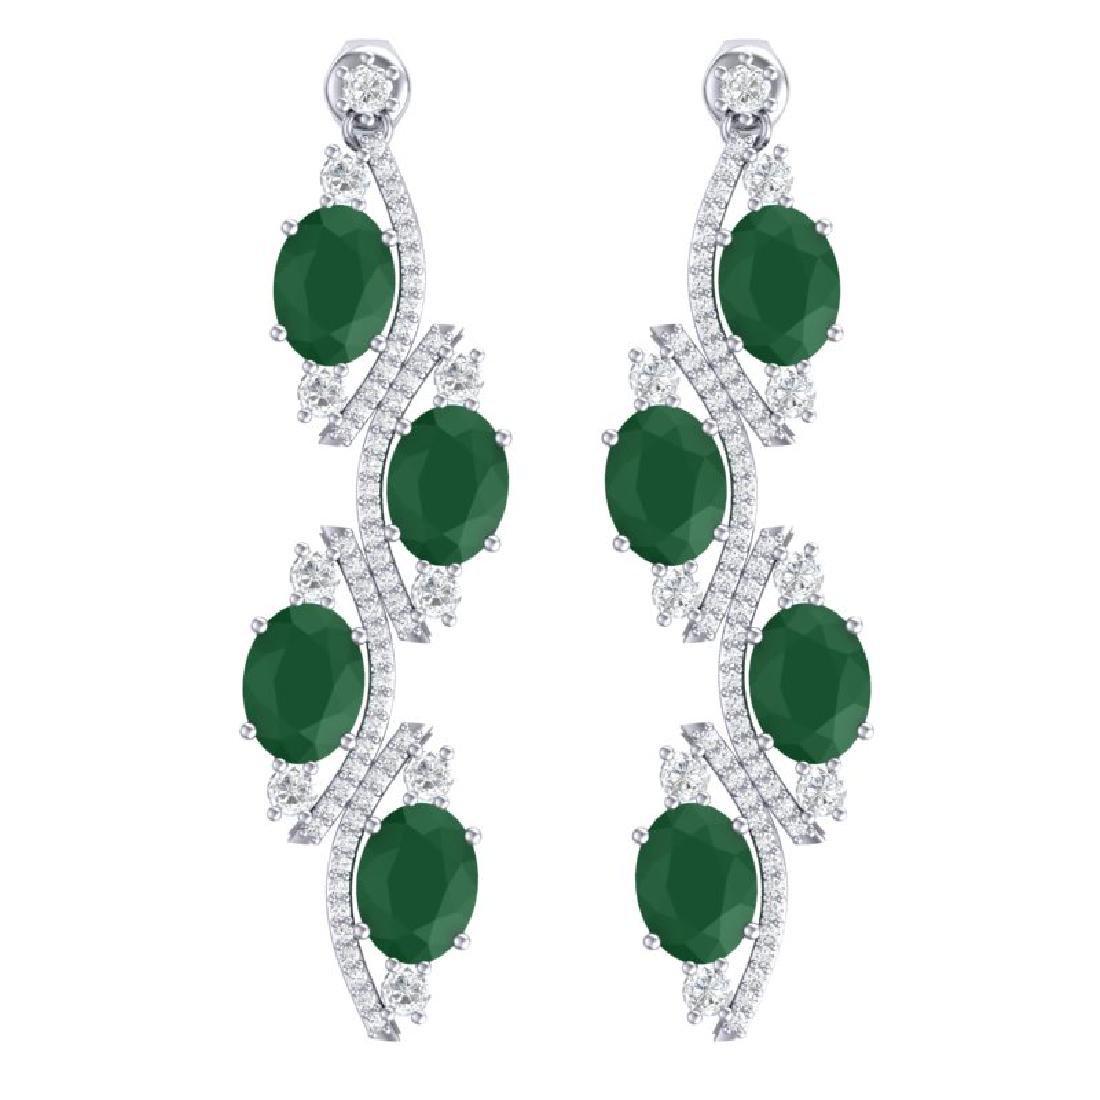 16.12 CTW Royalty Emerald & VS Diamond Earrings 18K